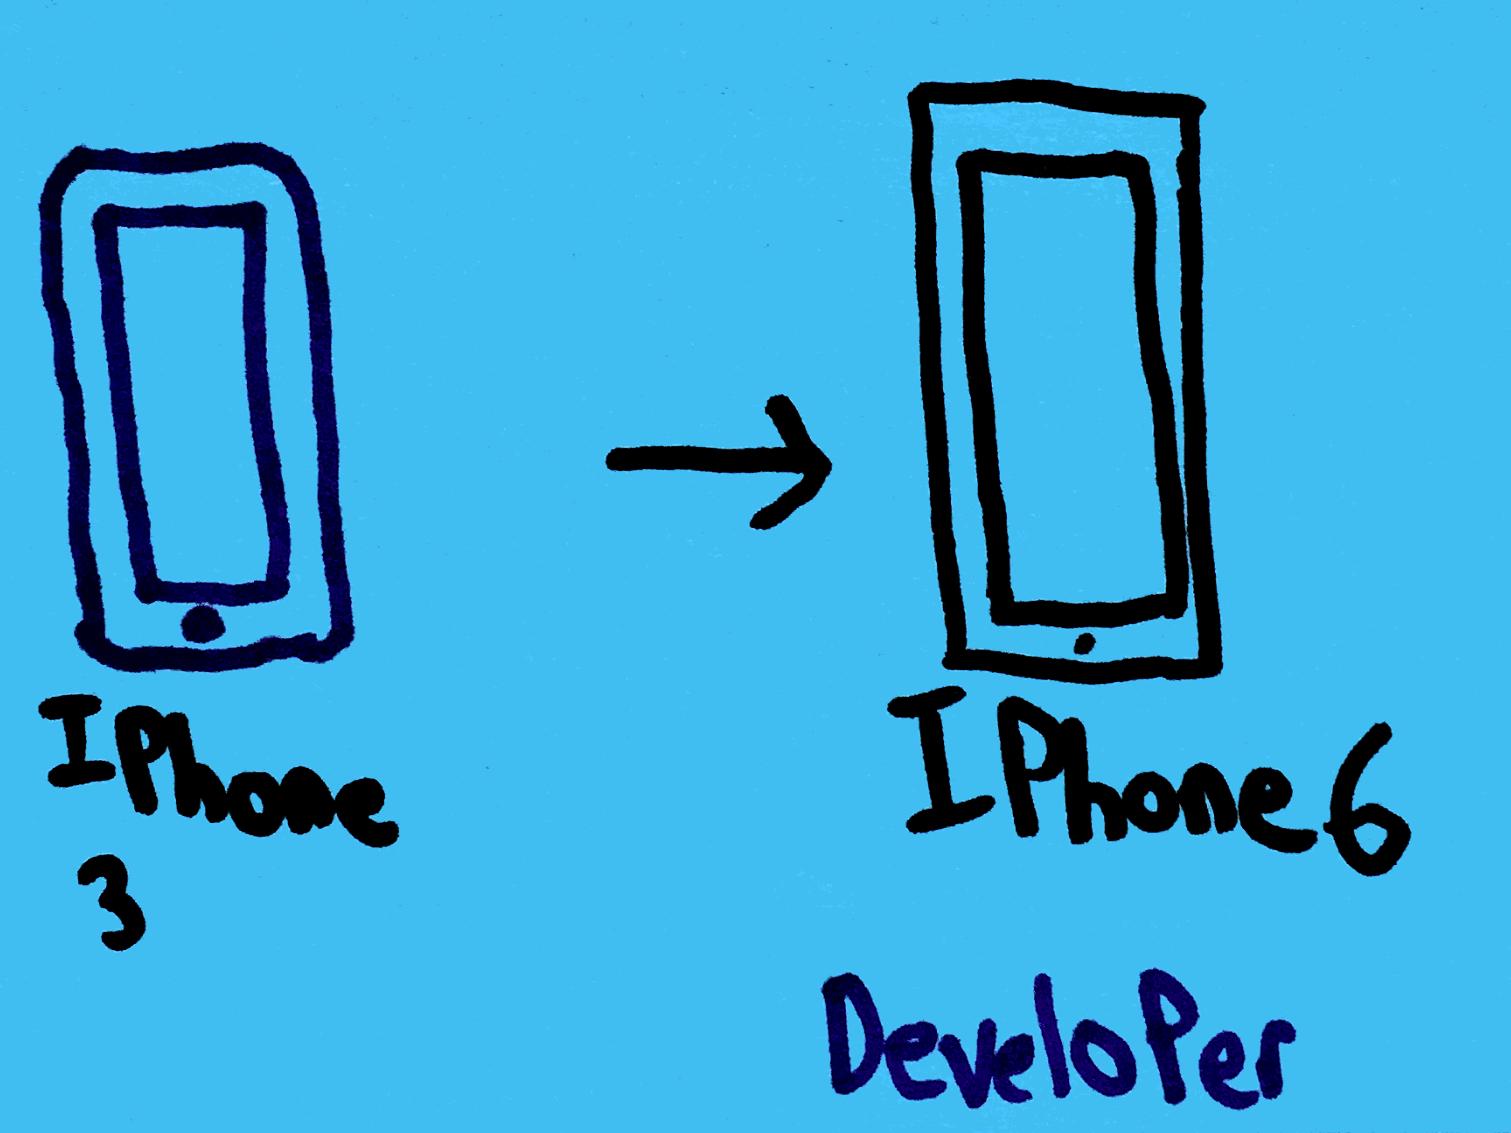 Developer Strengthsfinder Singapore Iphone 3 to 6